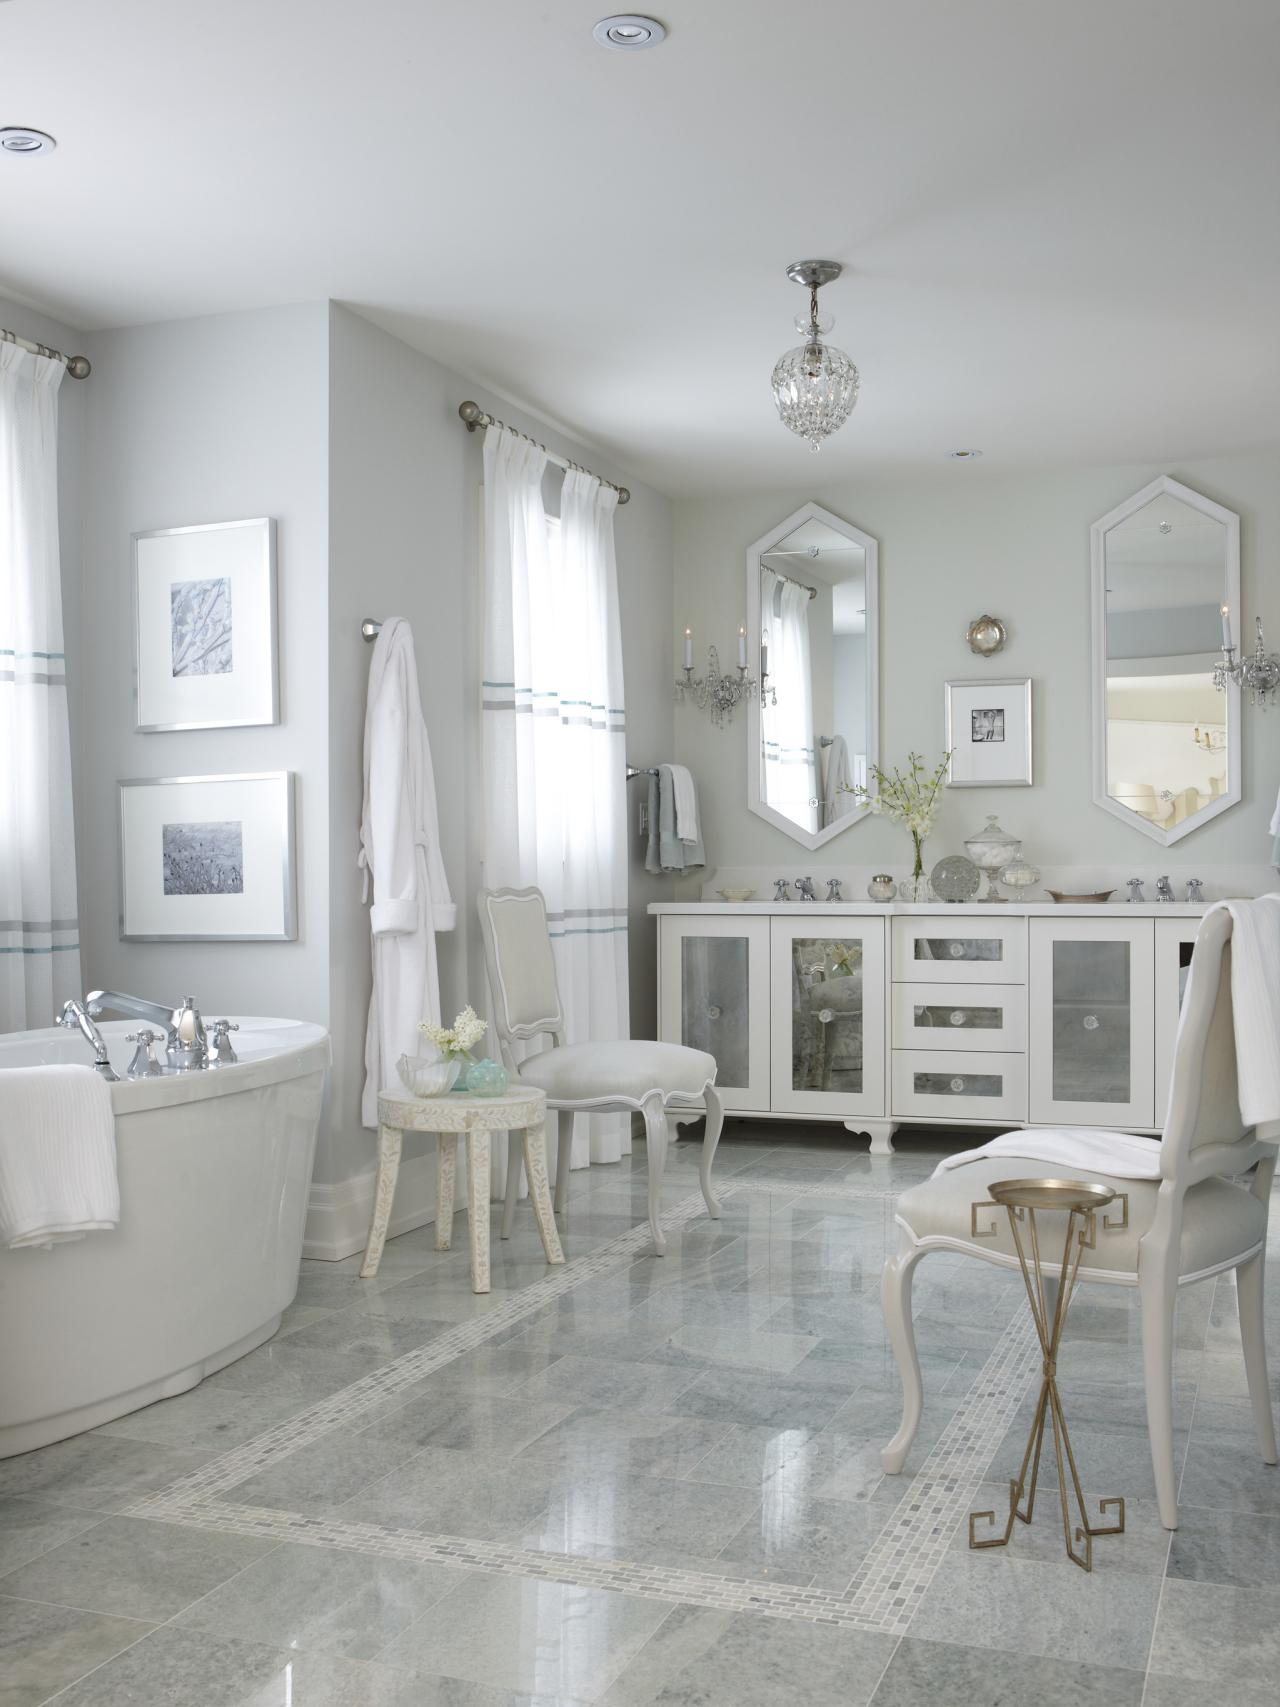 FLSRA411L_Master-Bathroom-Wide_s3x4.jpg.rend.hgtvcom.1280.1707